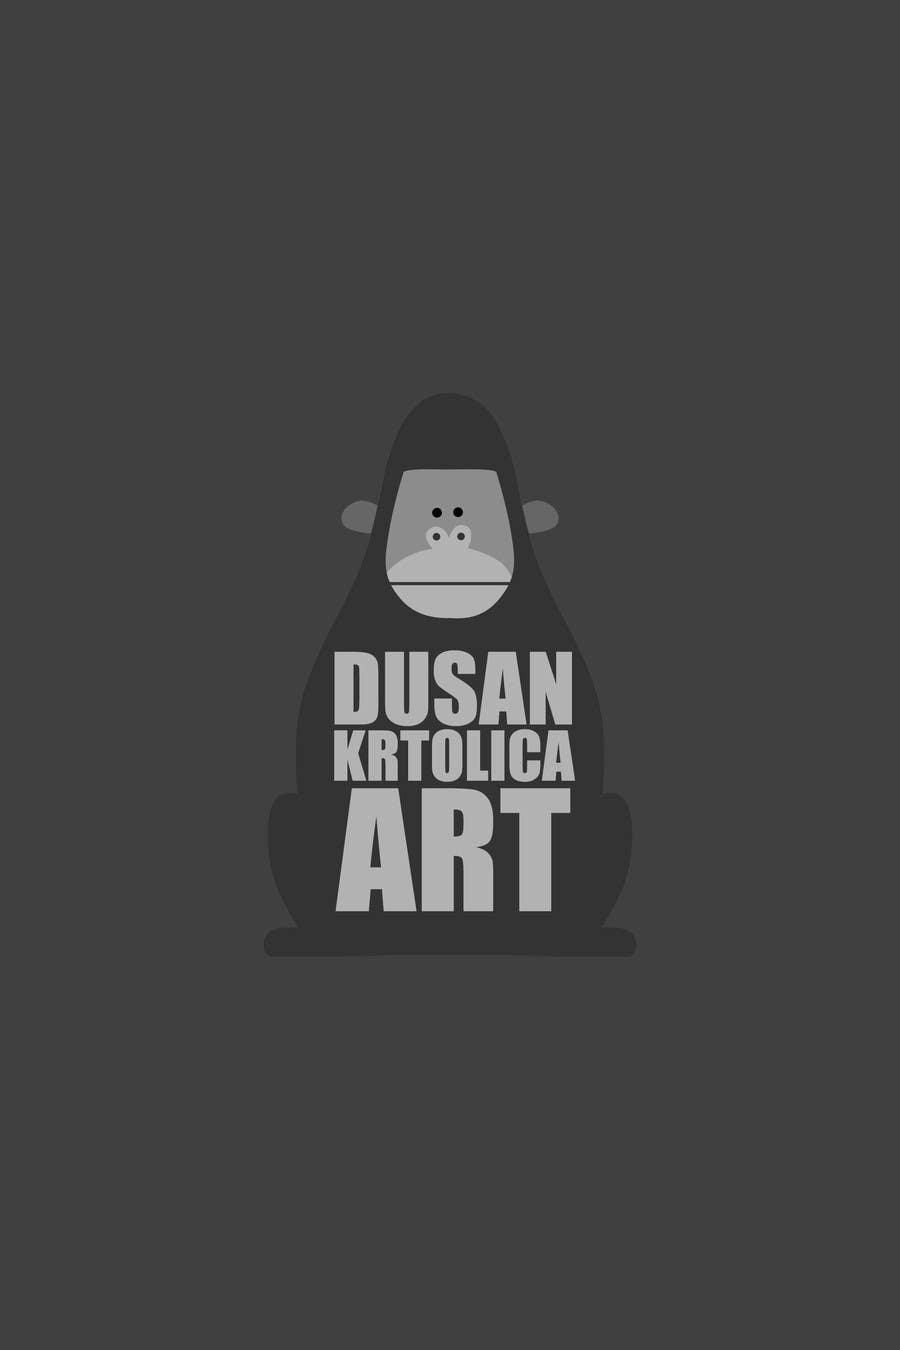 Kilpailutyö #24 kilpailussa Design a Logo for young artist